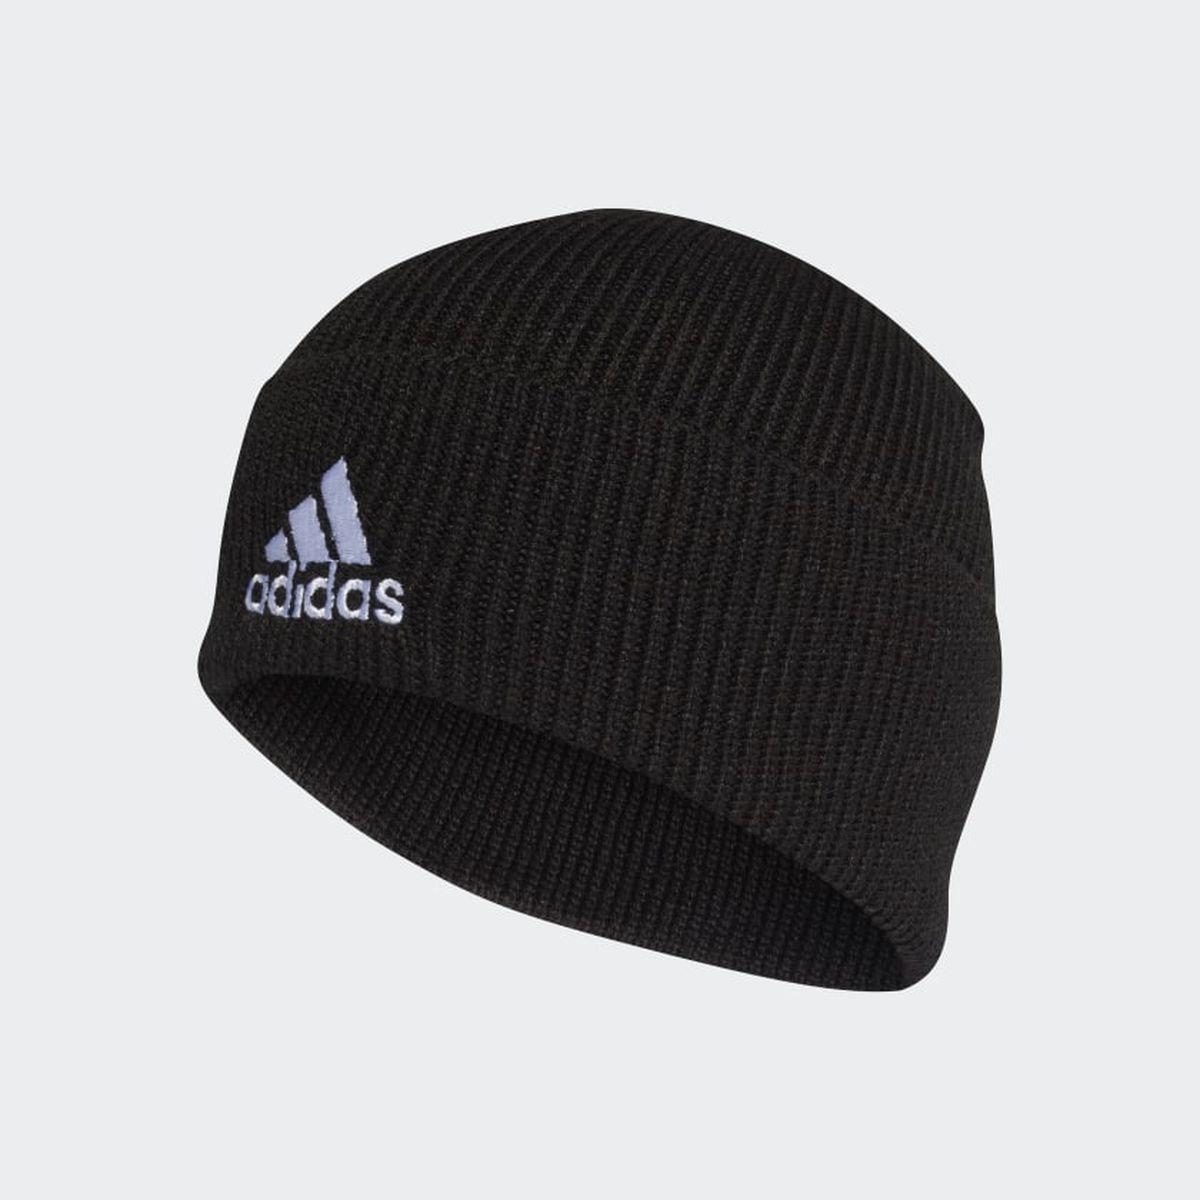 Фото - Шапка adidas Tiro Woolie шапка мужская adidas tiro beanie цвет черный bq1662 размер 58 60